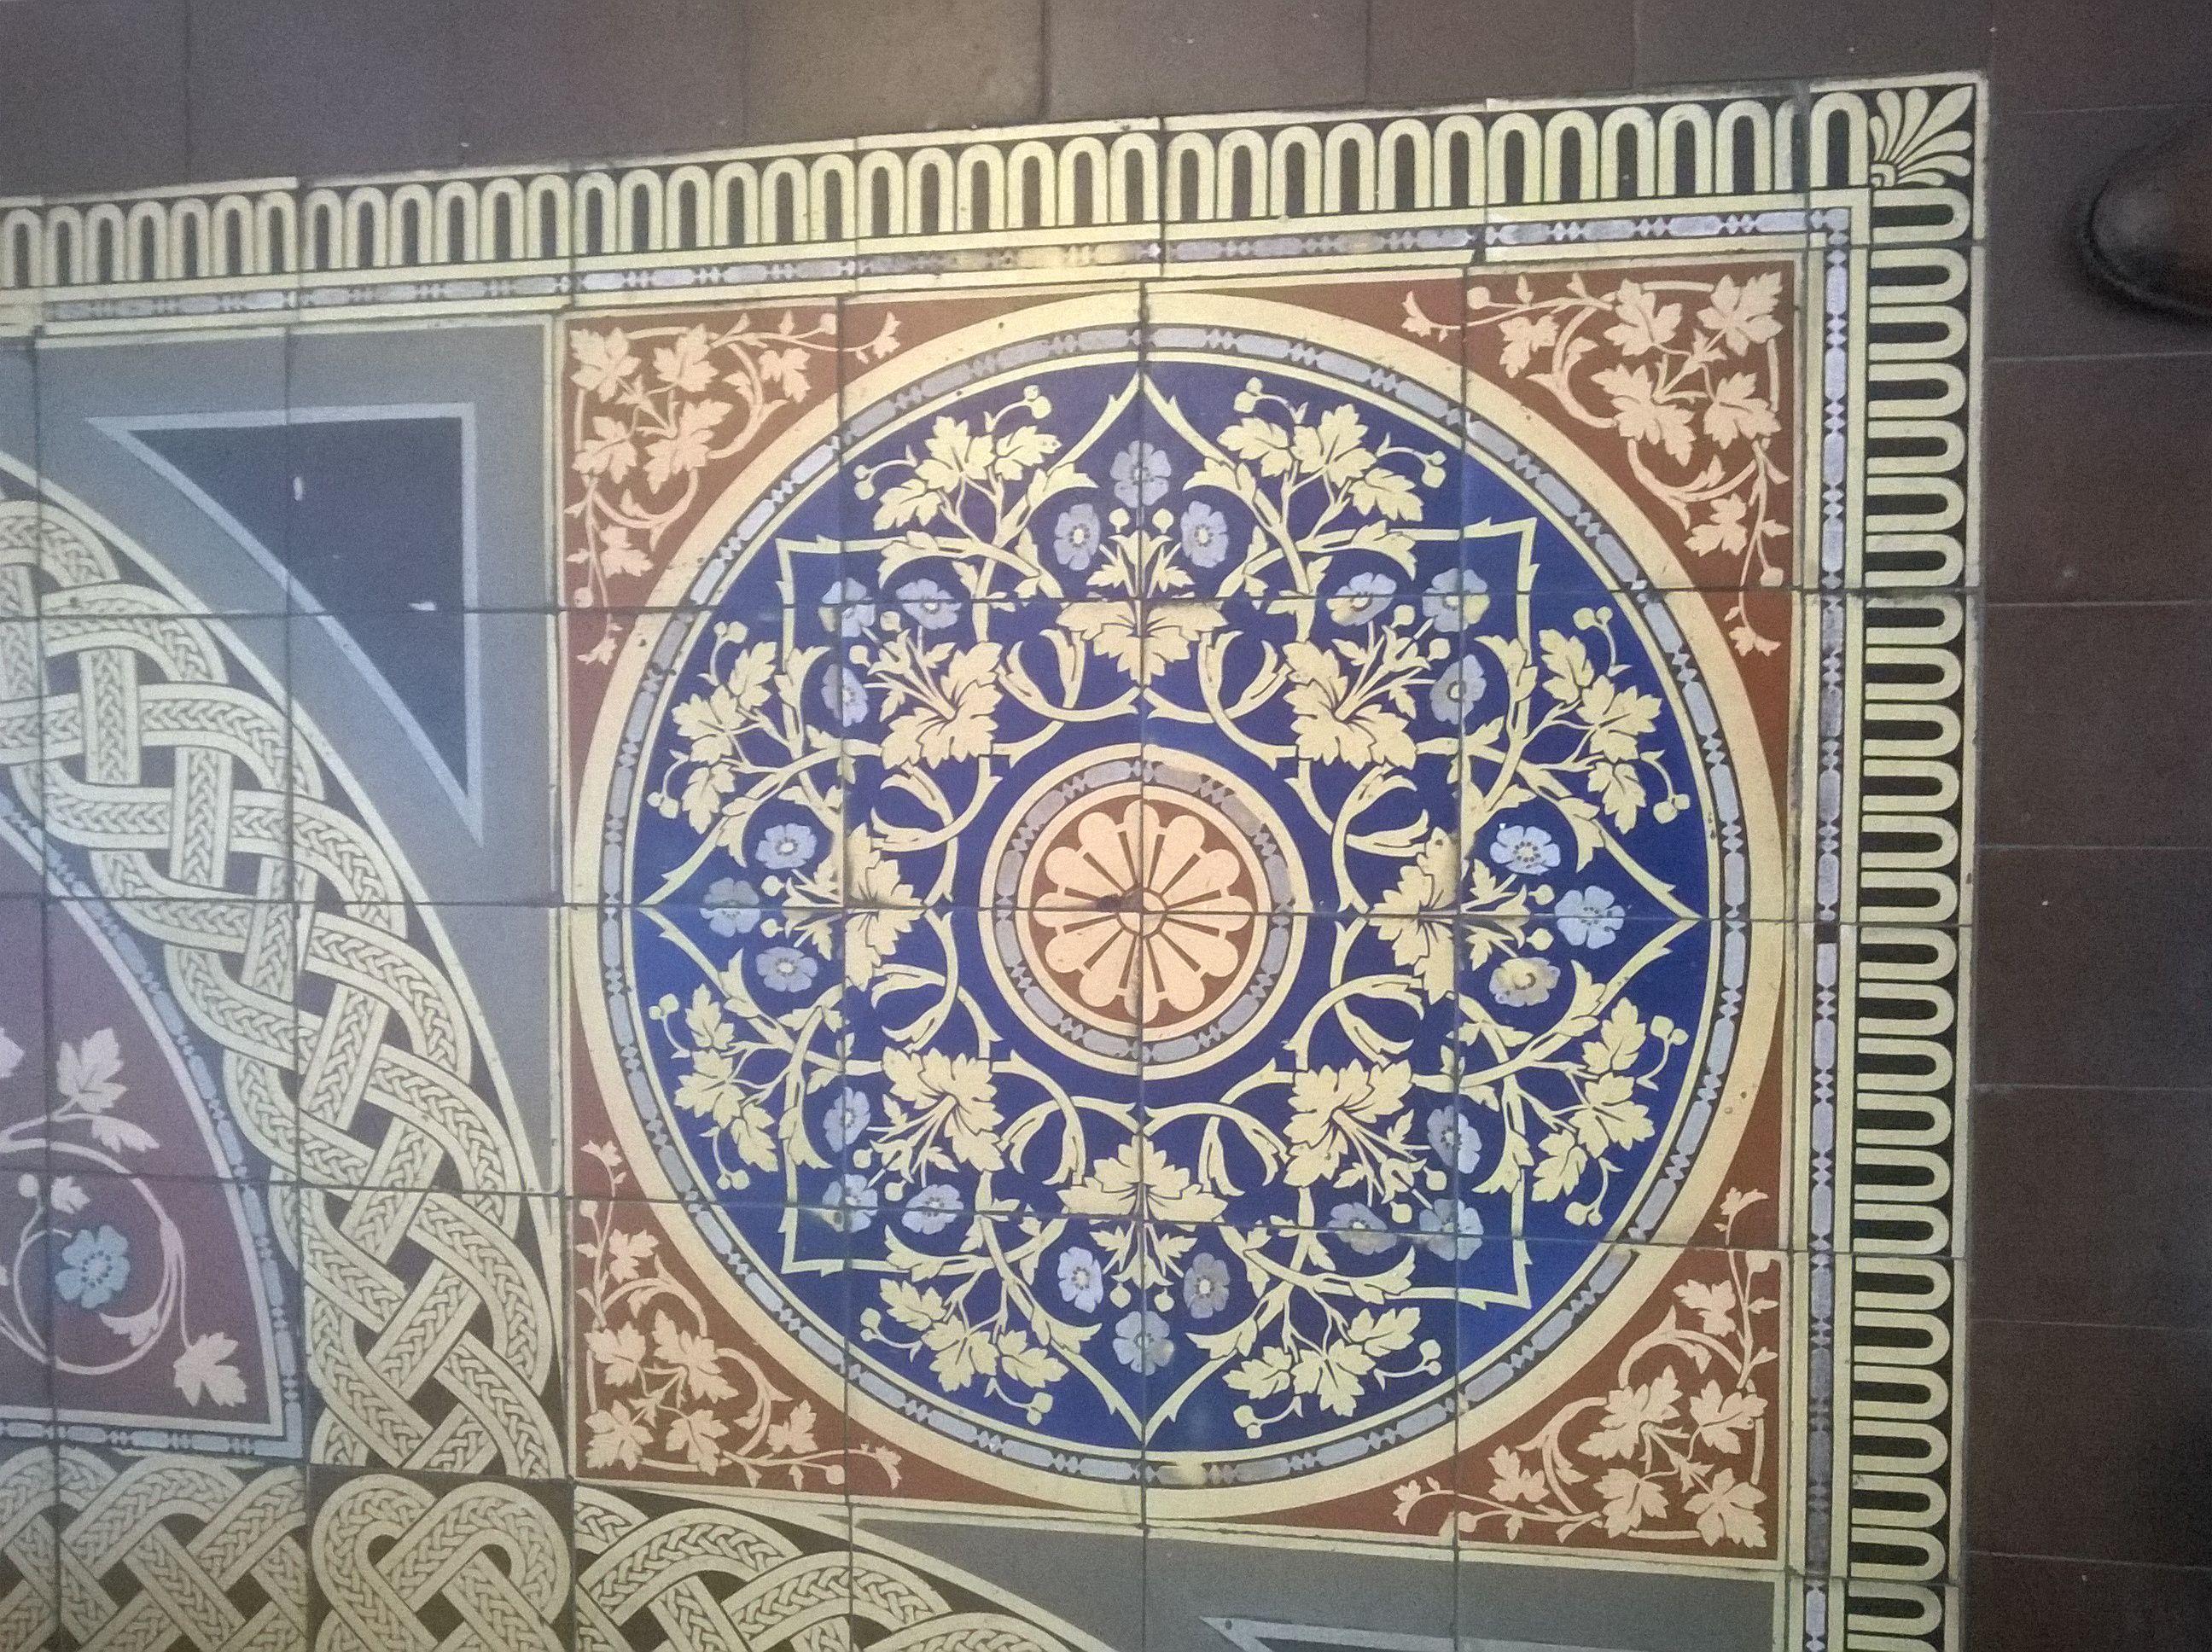 Museum of Scotland Edinburgh floor tiles. | Tile patterns ...